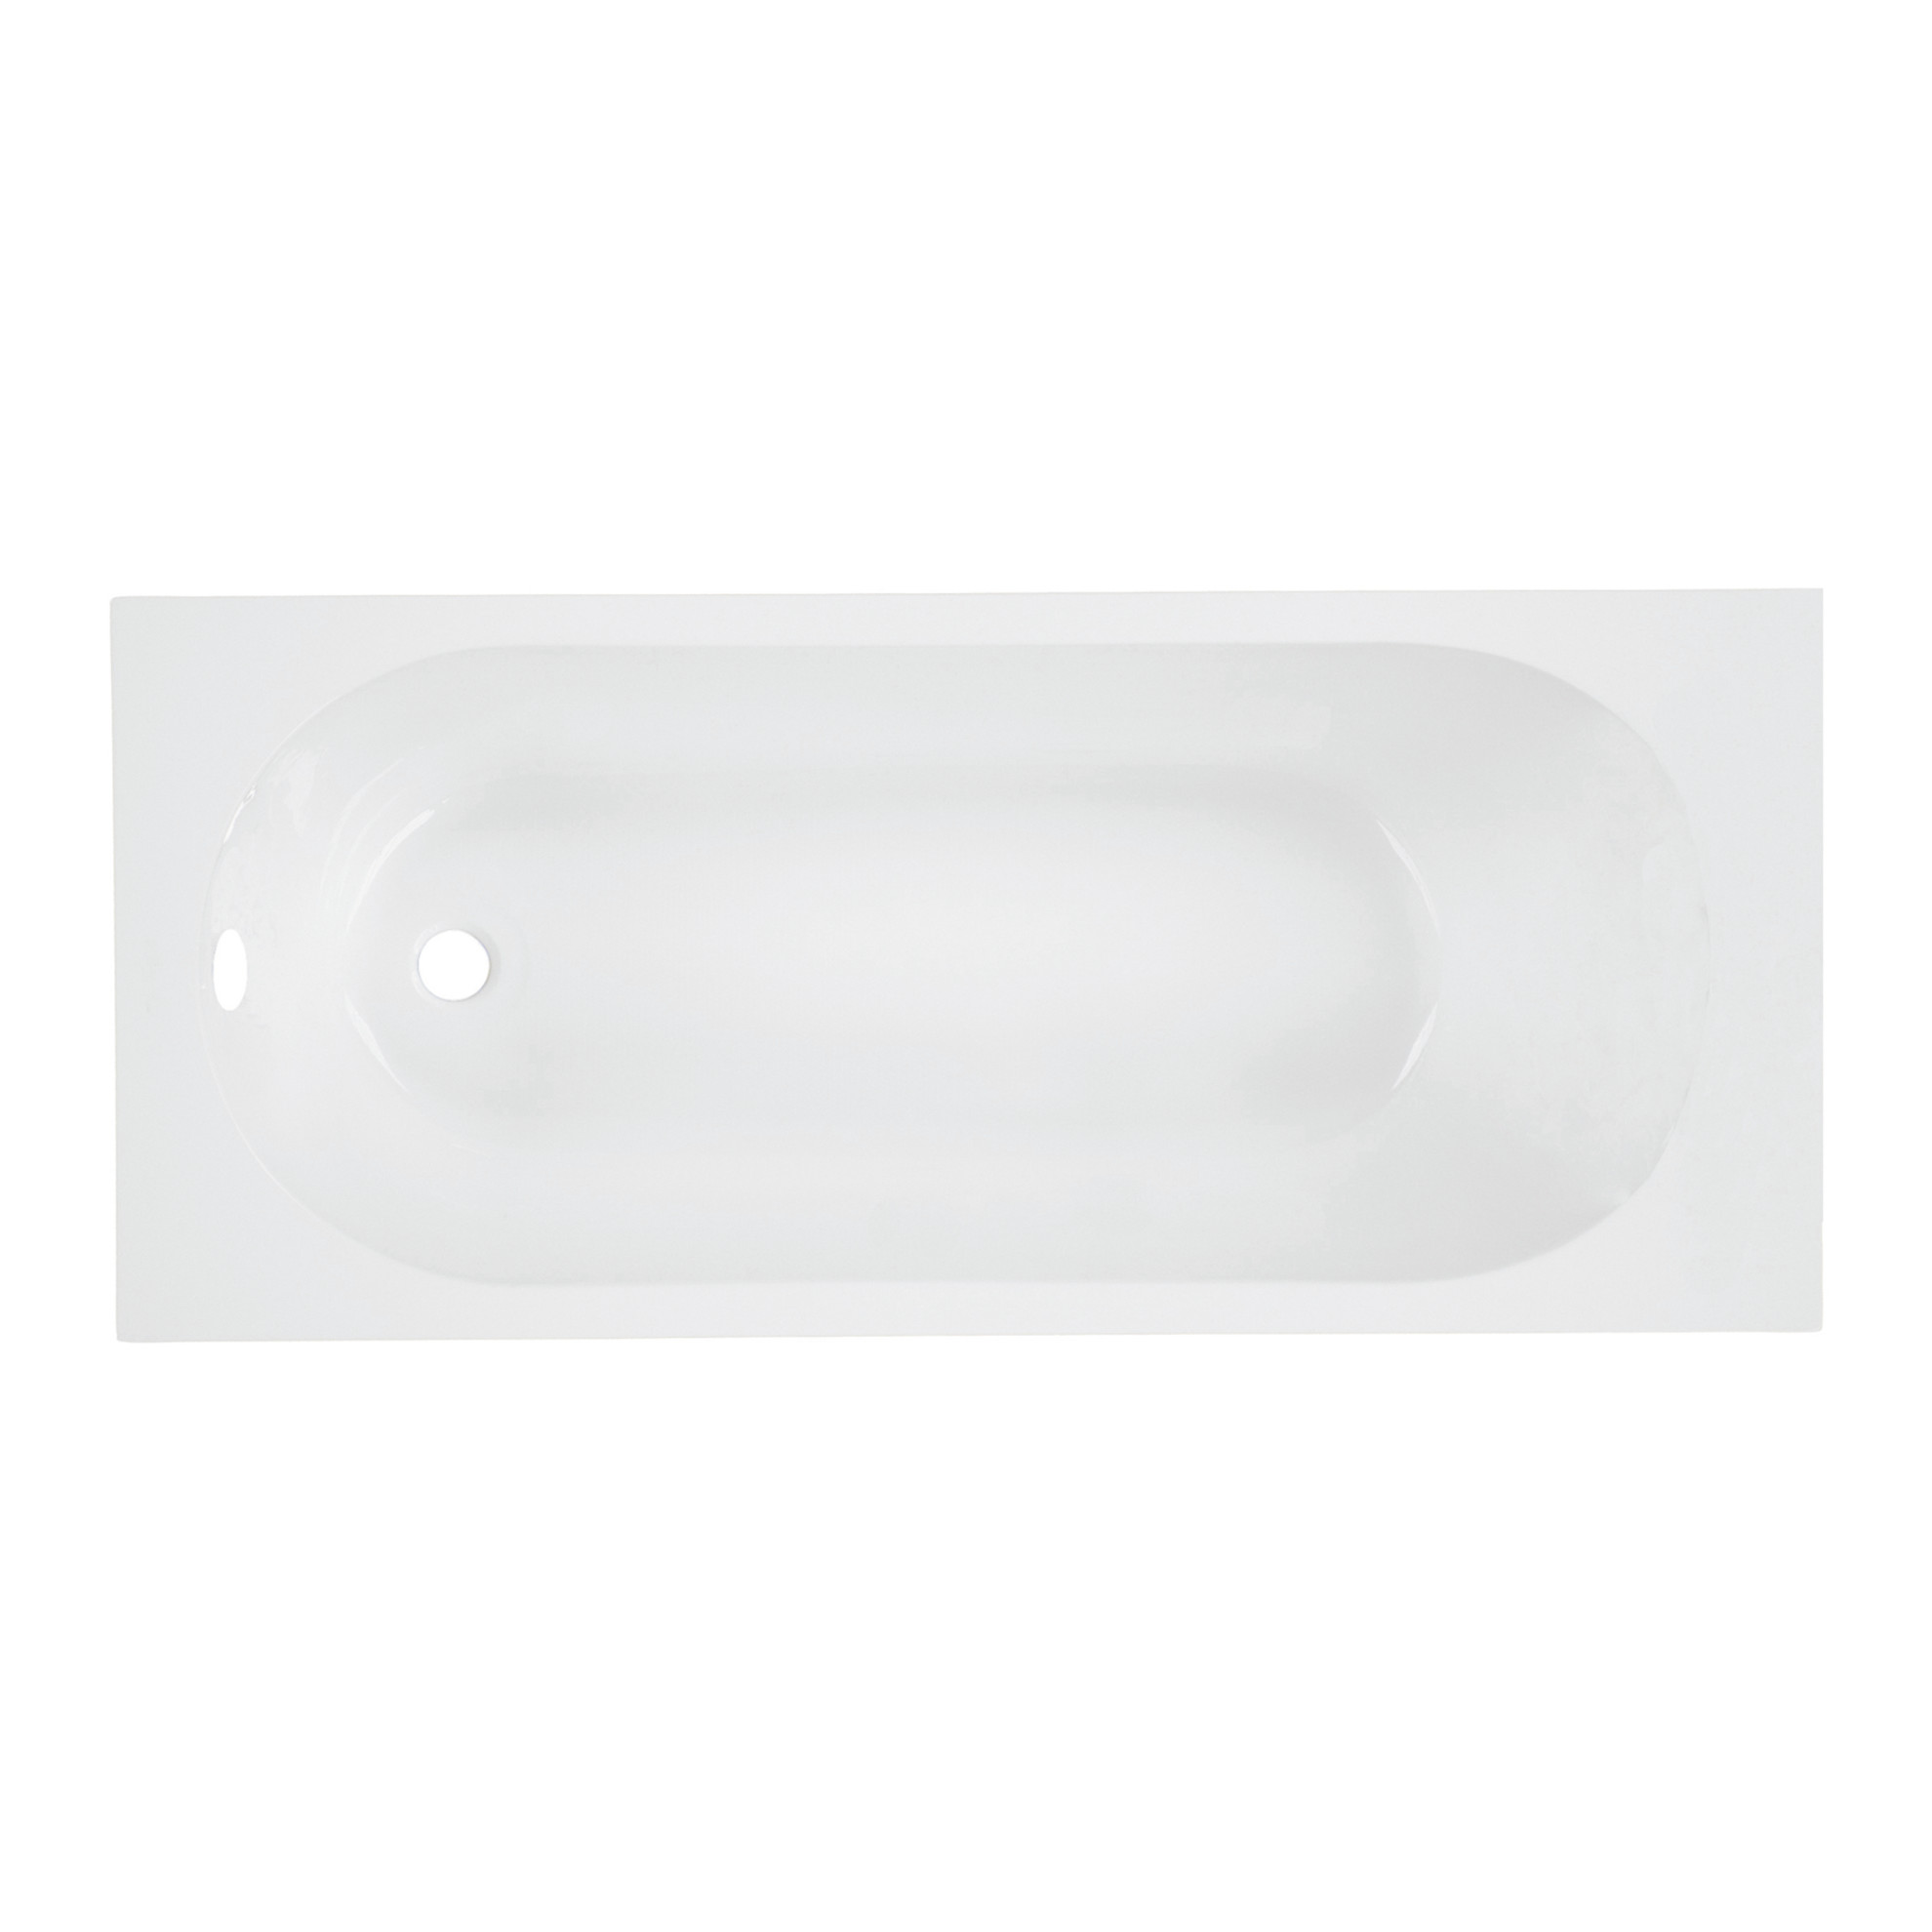 Rivestire vasca da bagno costi top s ti interessano i prezzi vasche with rivestire vasca da for Costi vasche da bagno